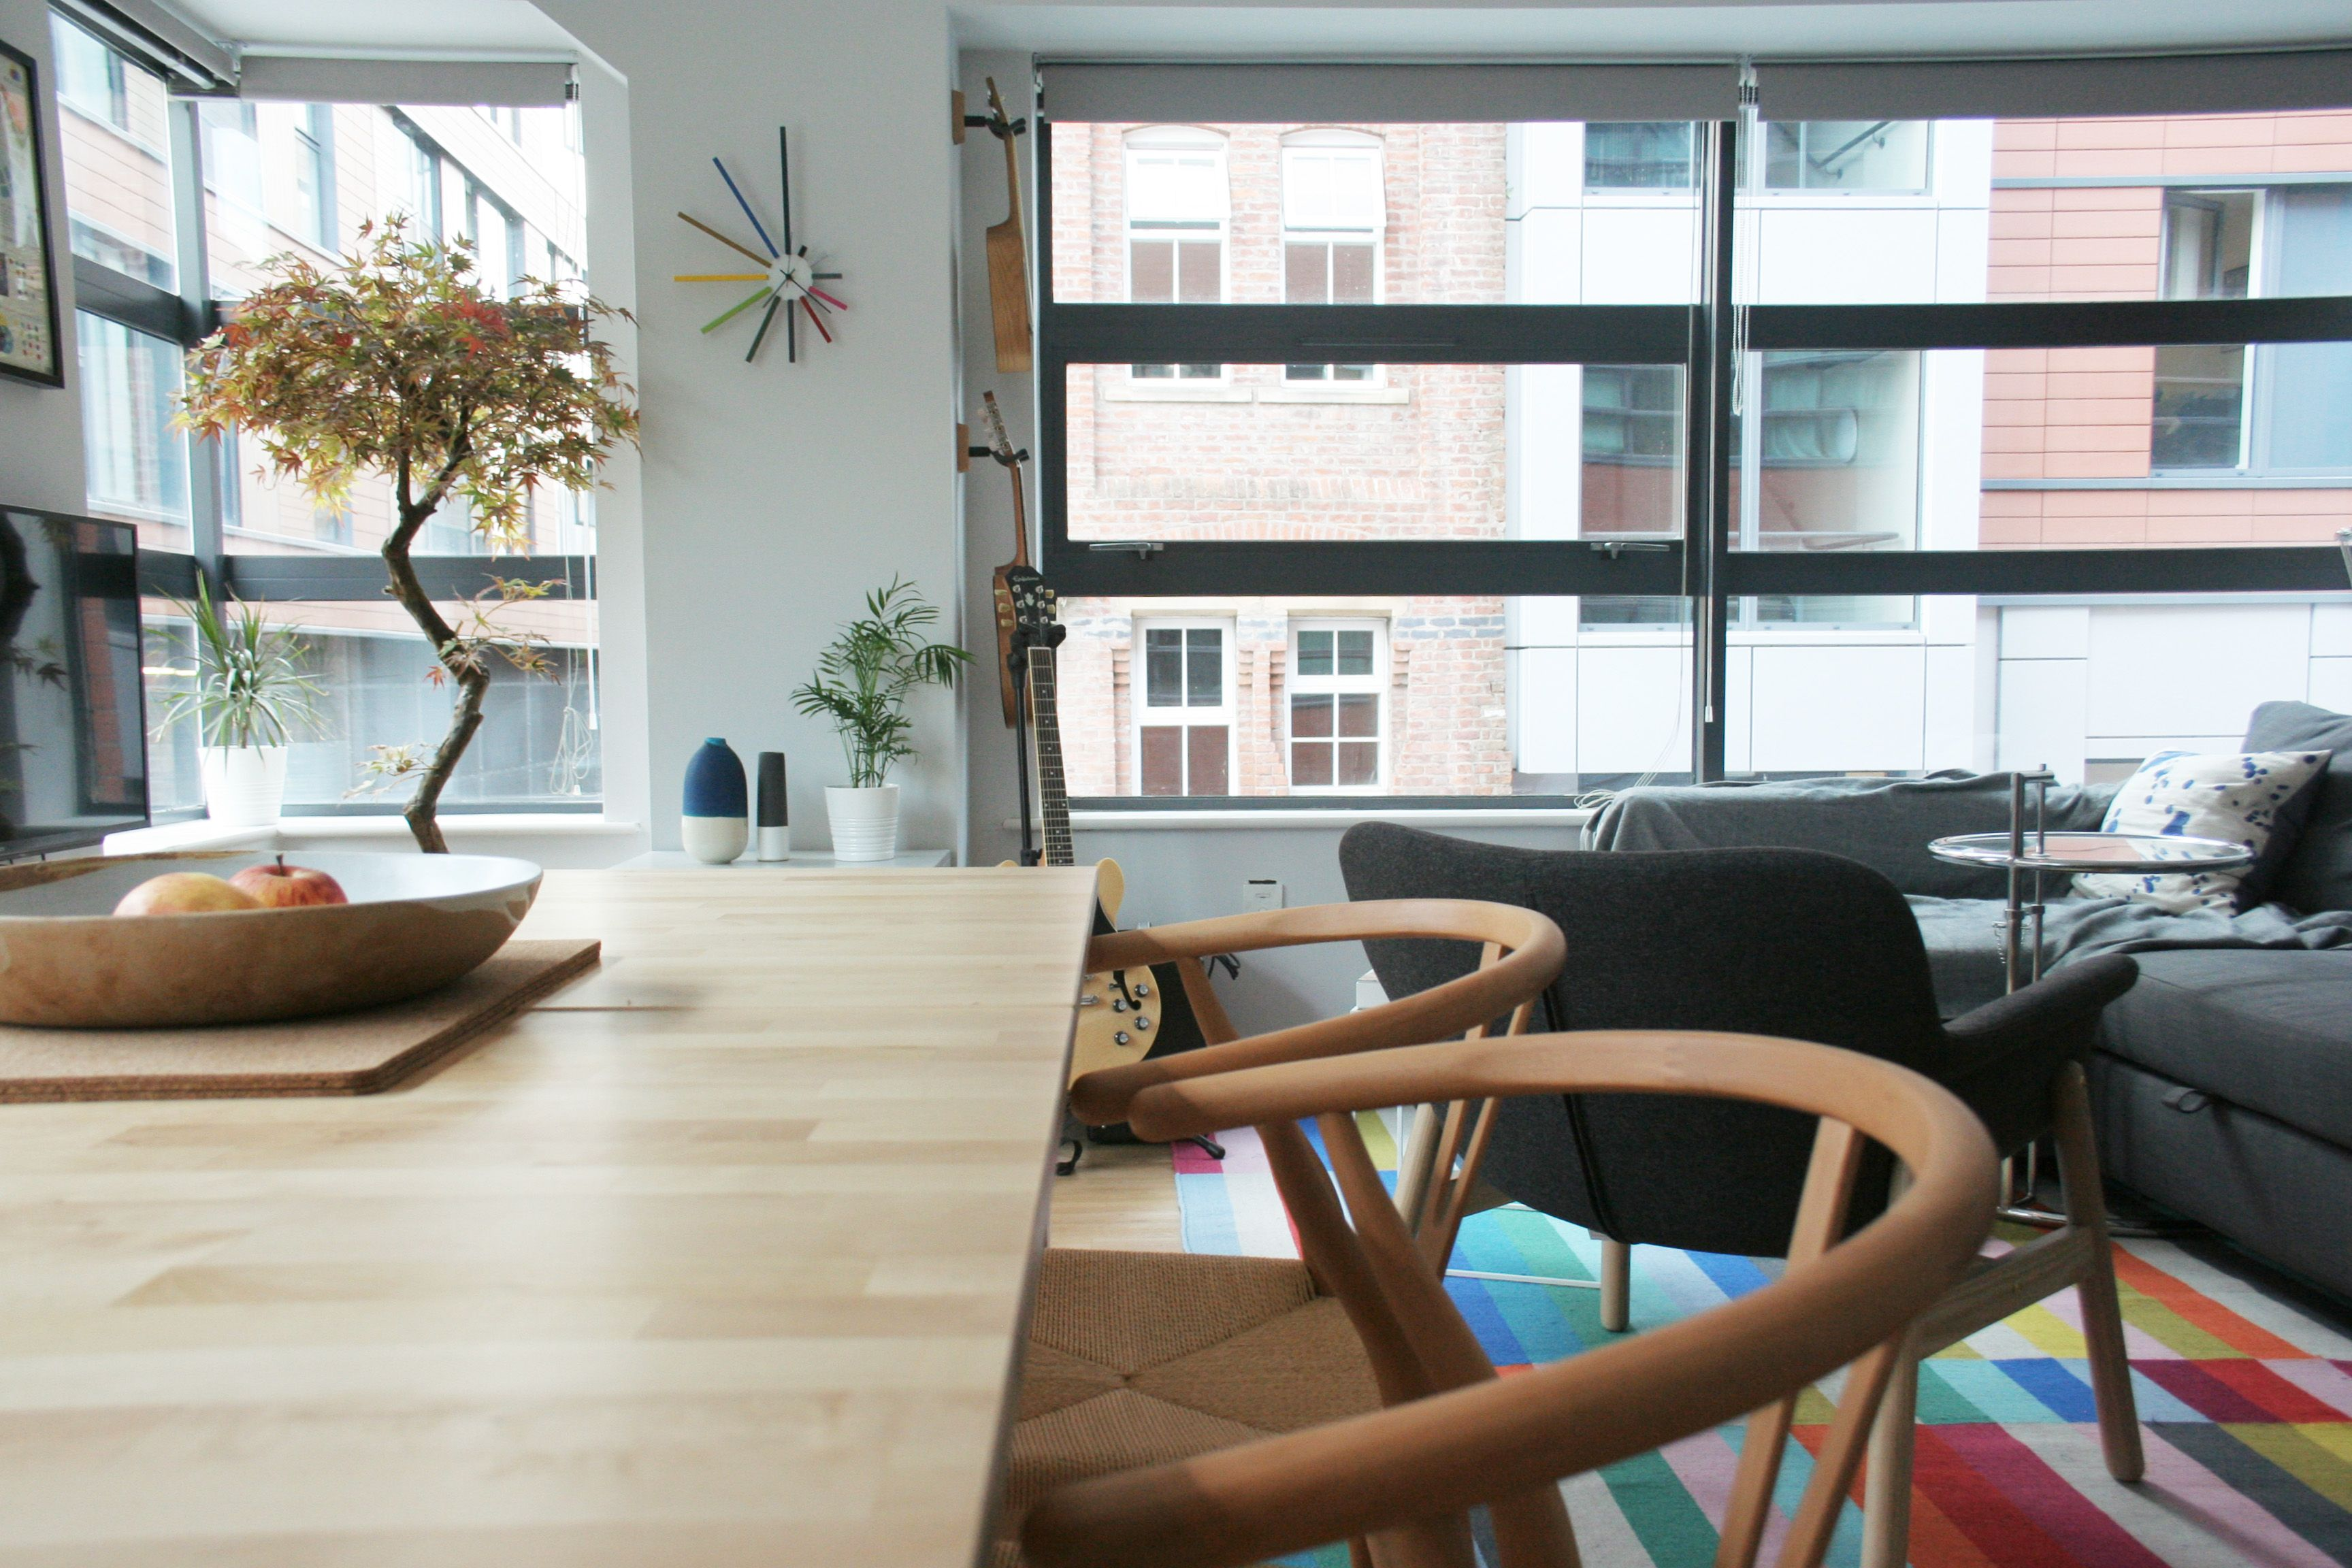 Manchester Flat Hans Wegner Wishbone chairs IKEA Vedbo armchair